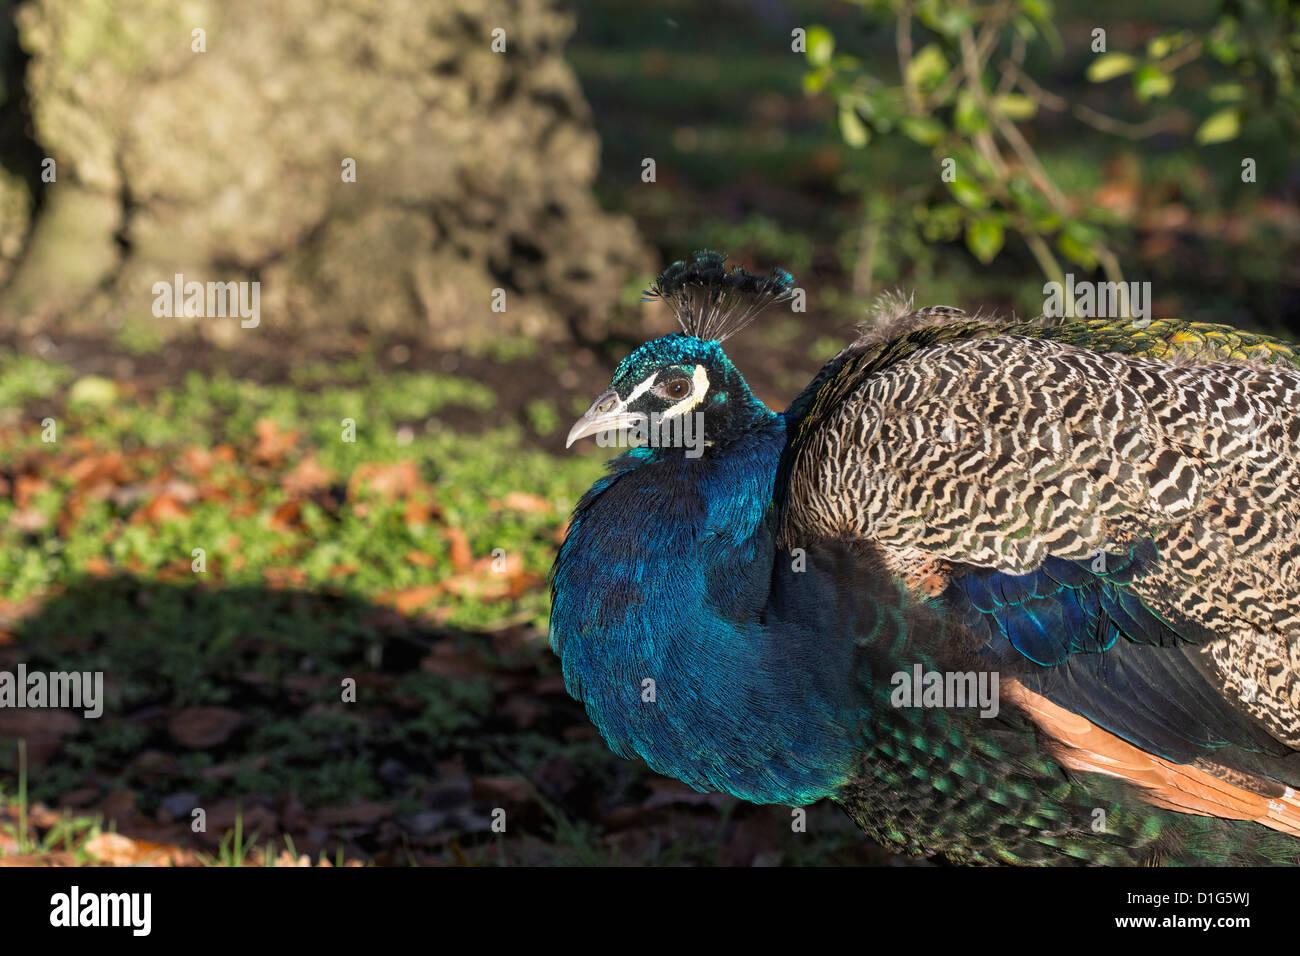 A peacock (Pavo cristatus) with iridescent blue-green plumage at Kew Gradens, Surrey Stock Photo